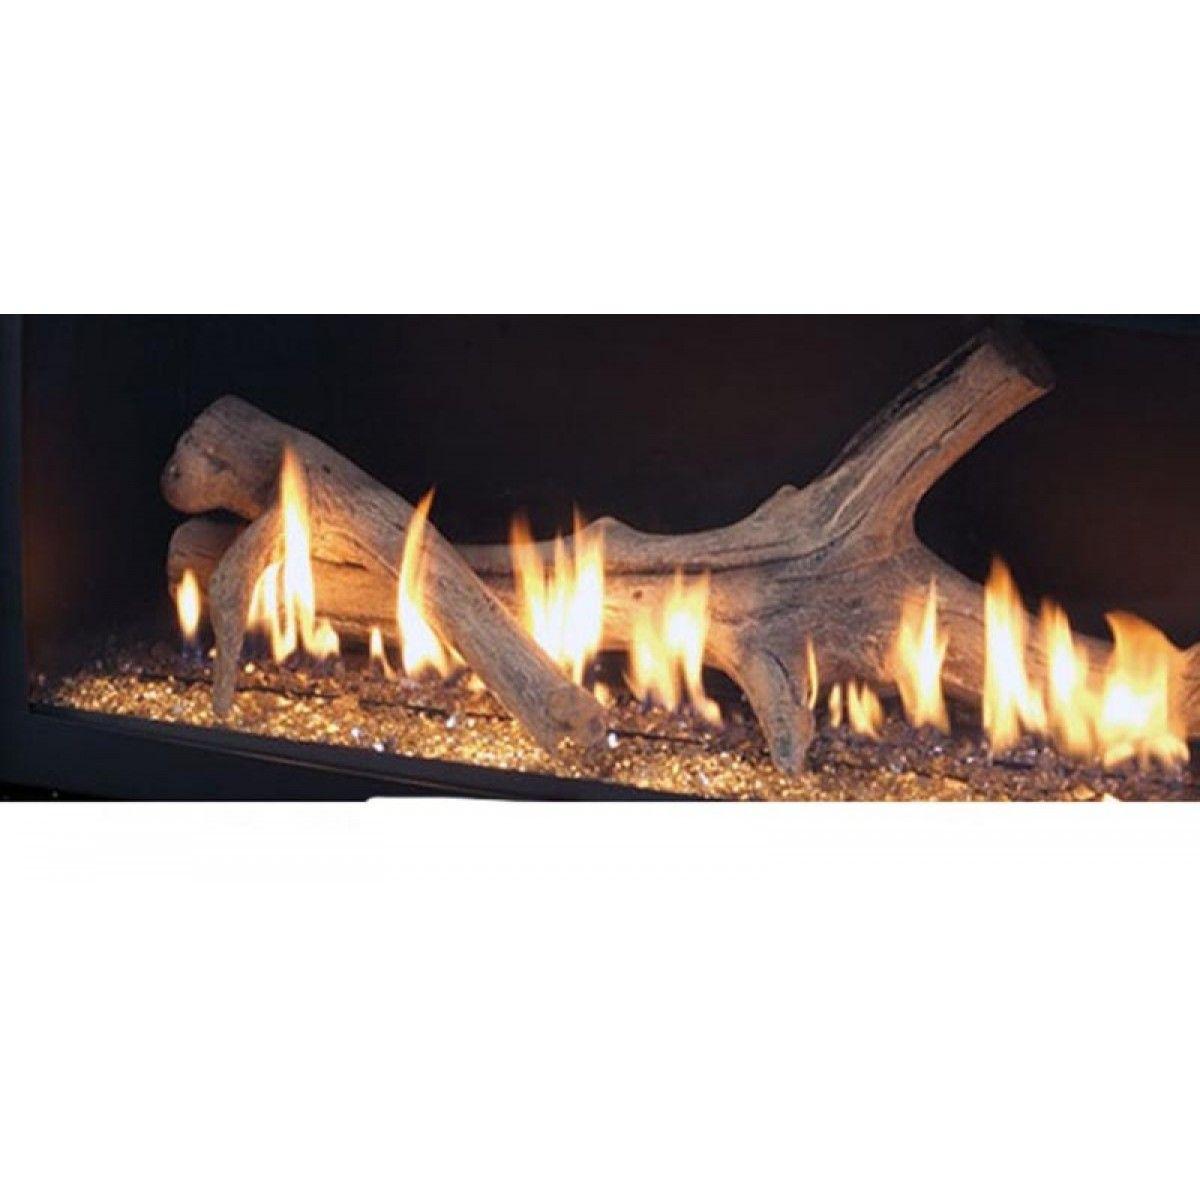 Majestic Adw600 Aged Driftwood Log Set For Wdv600 Modern Gas